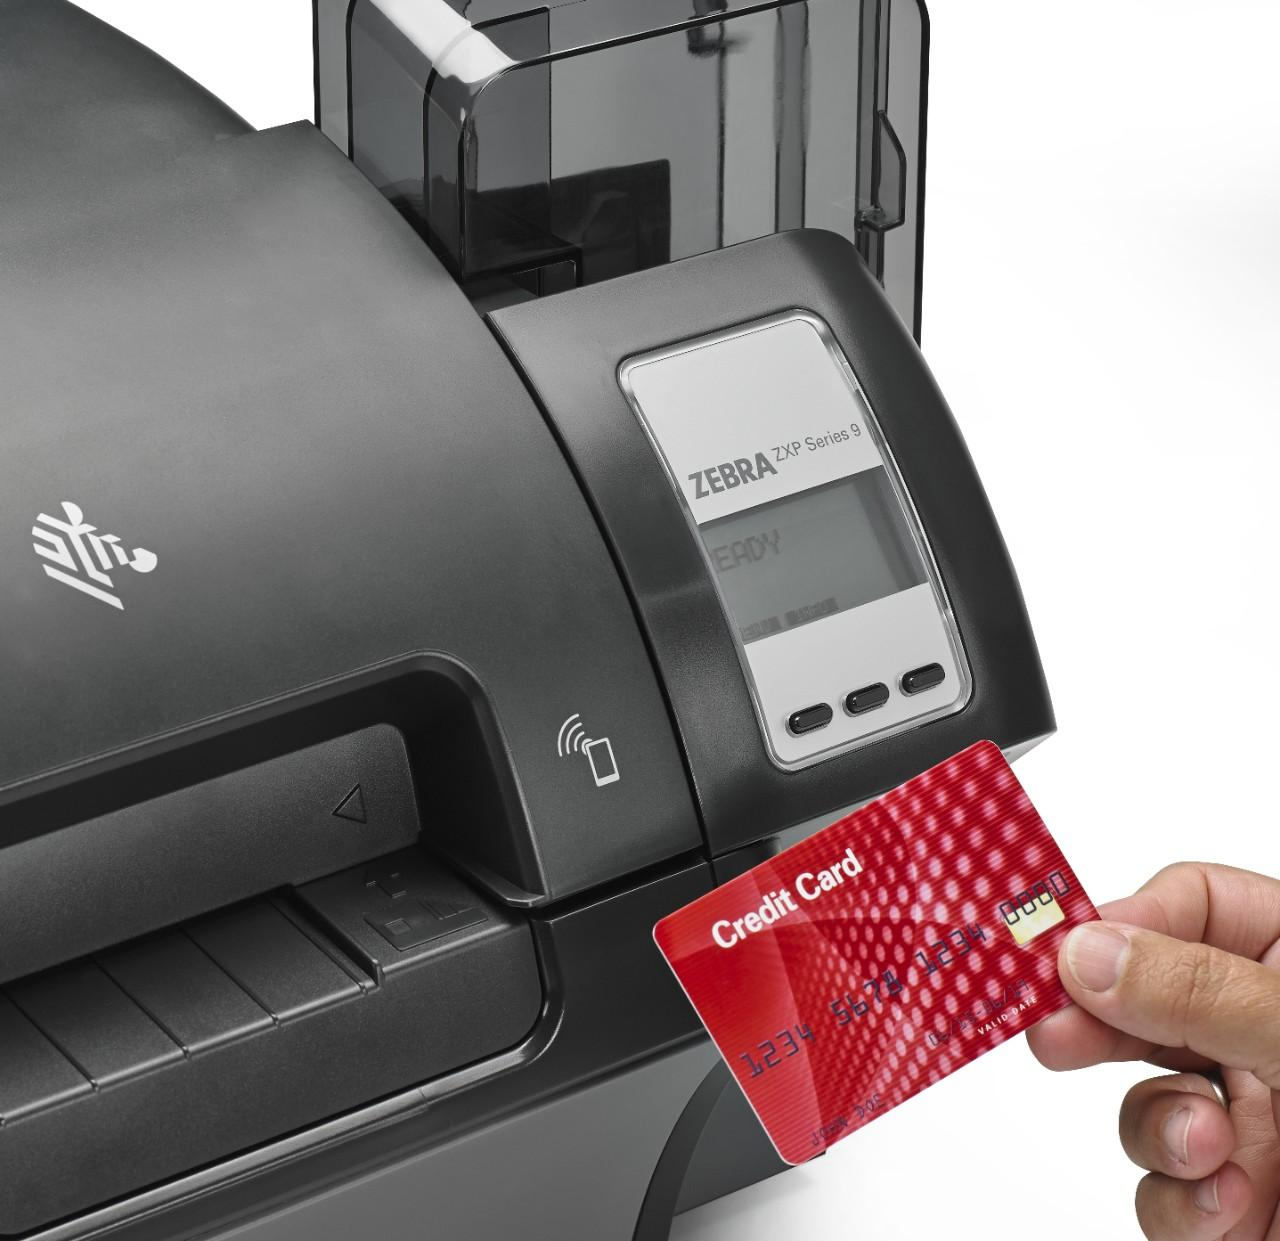 zxp9-finance-product-photography-hand-print-72dpi.jpeg